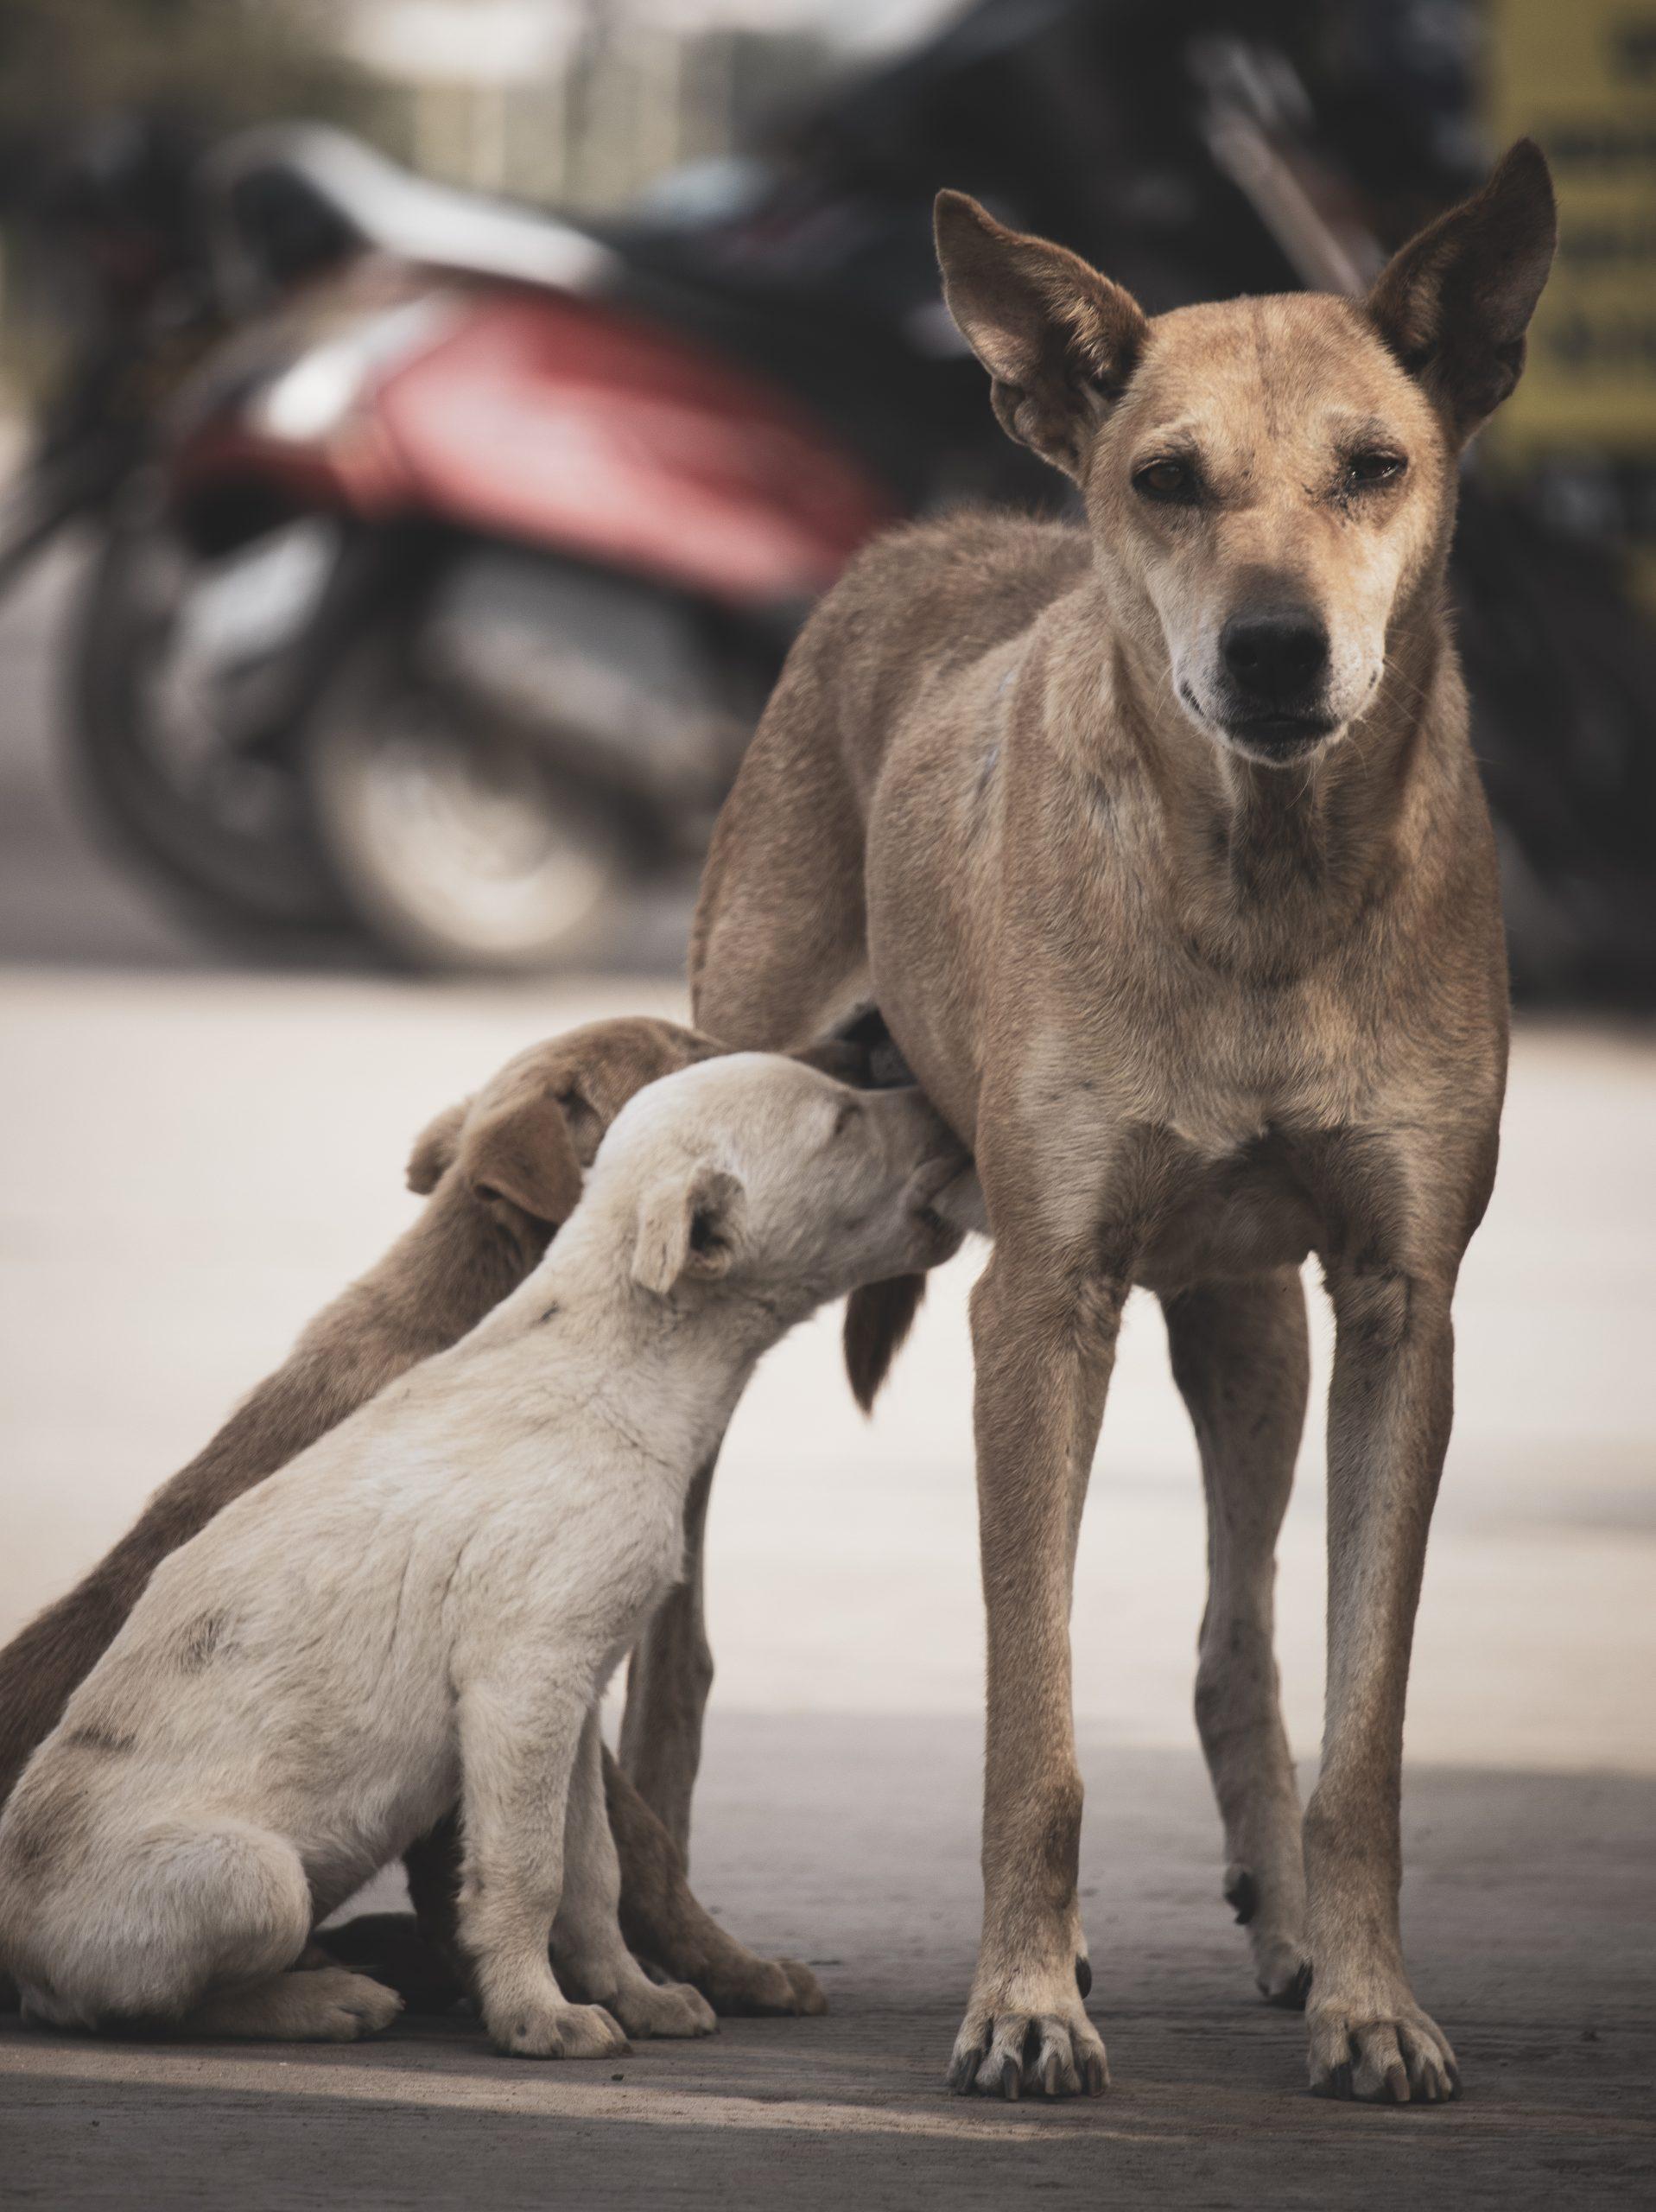 Bitch feeding puppies